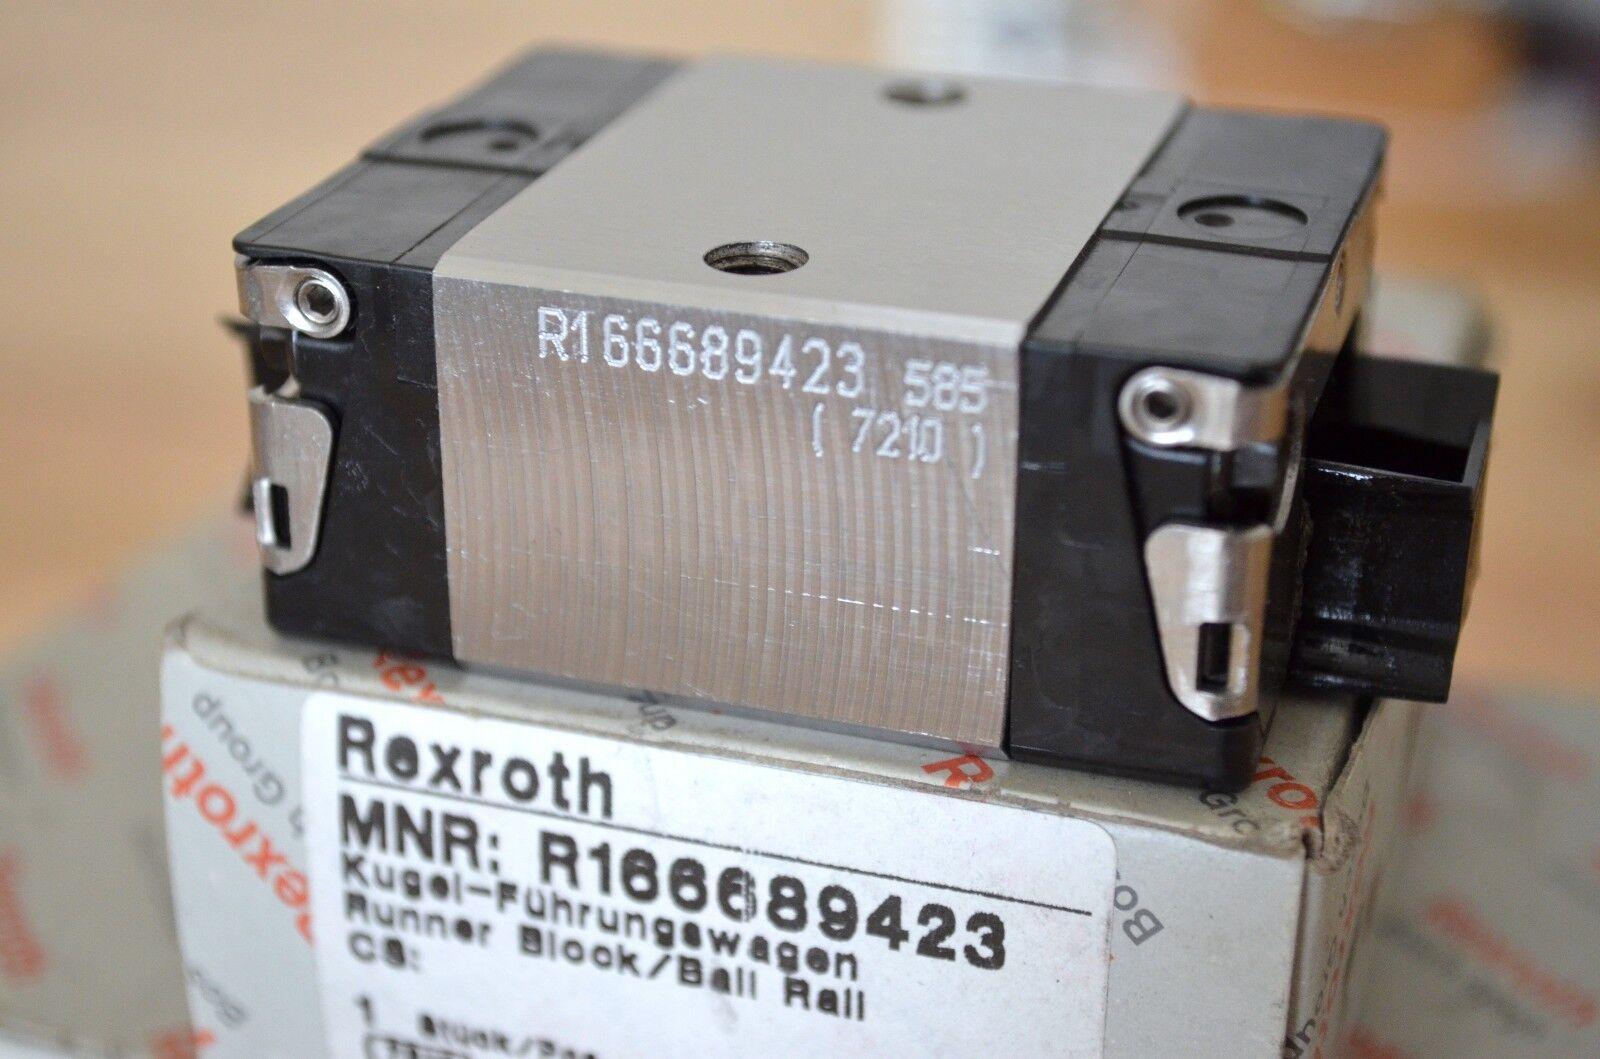 R1653 313 20 Bosch Rexroth Star Used 35 size LM Guide Block Cartridge maintenanc